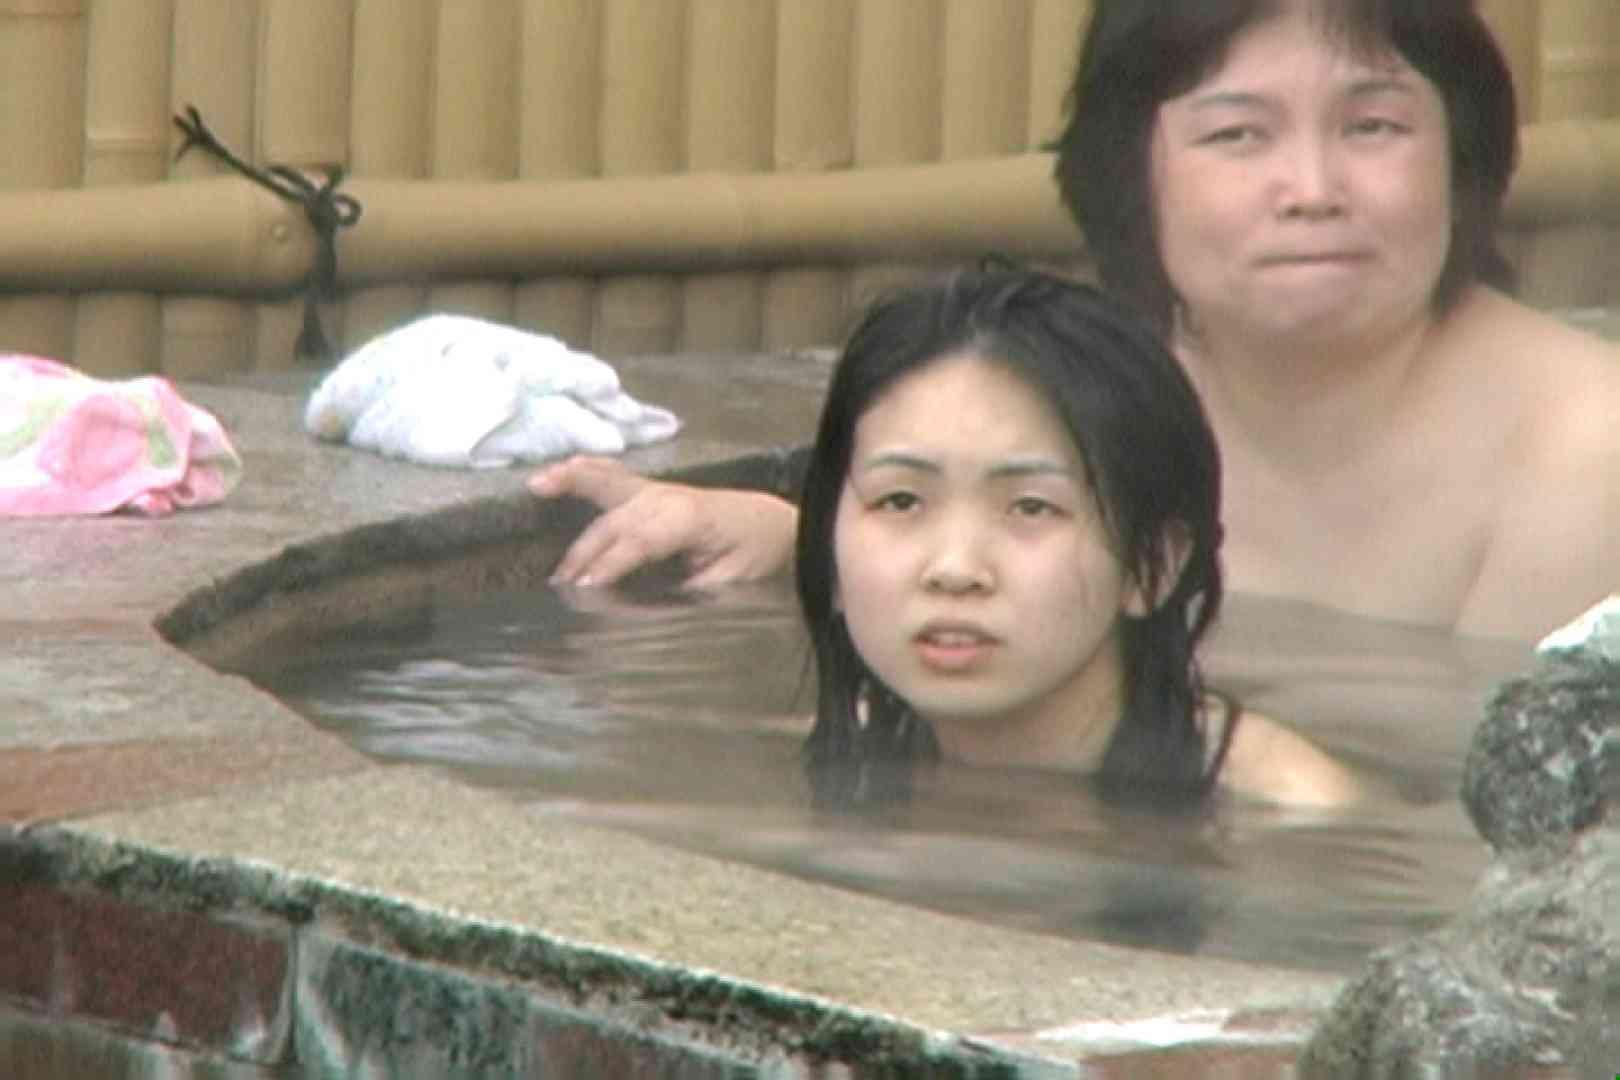 Aquaな露天風呂Vol.646 OLセックス | 盗撮  97画像 25